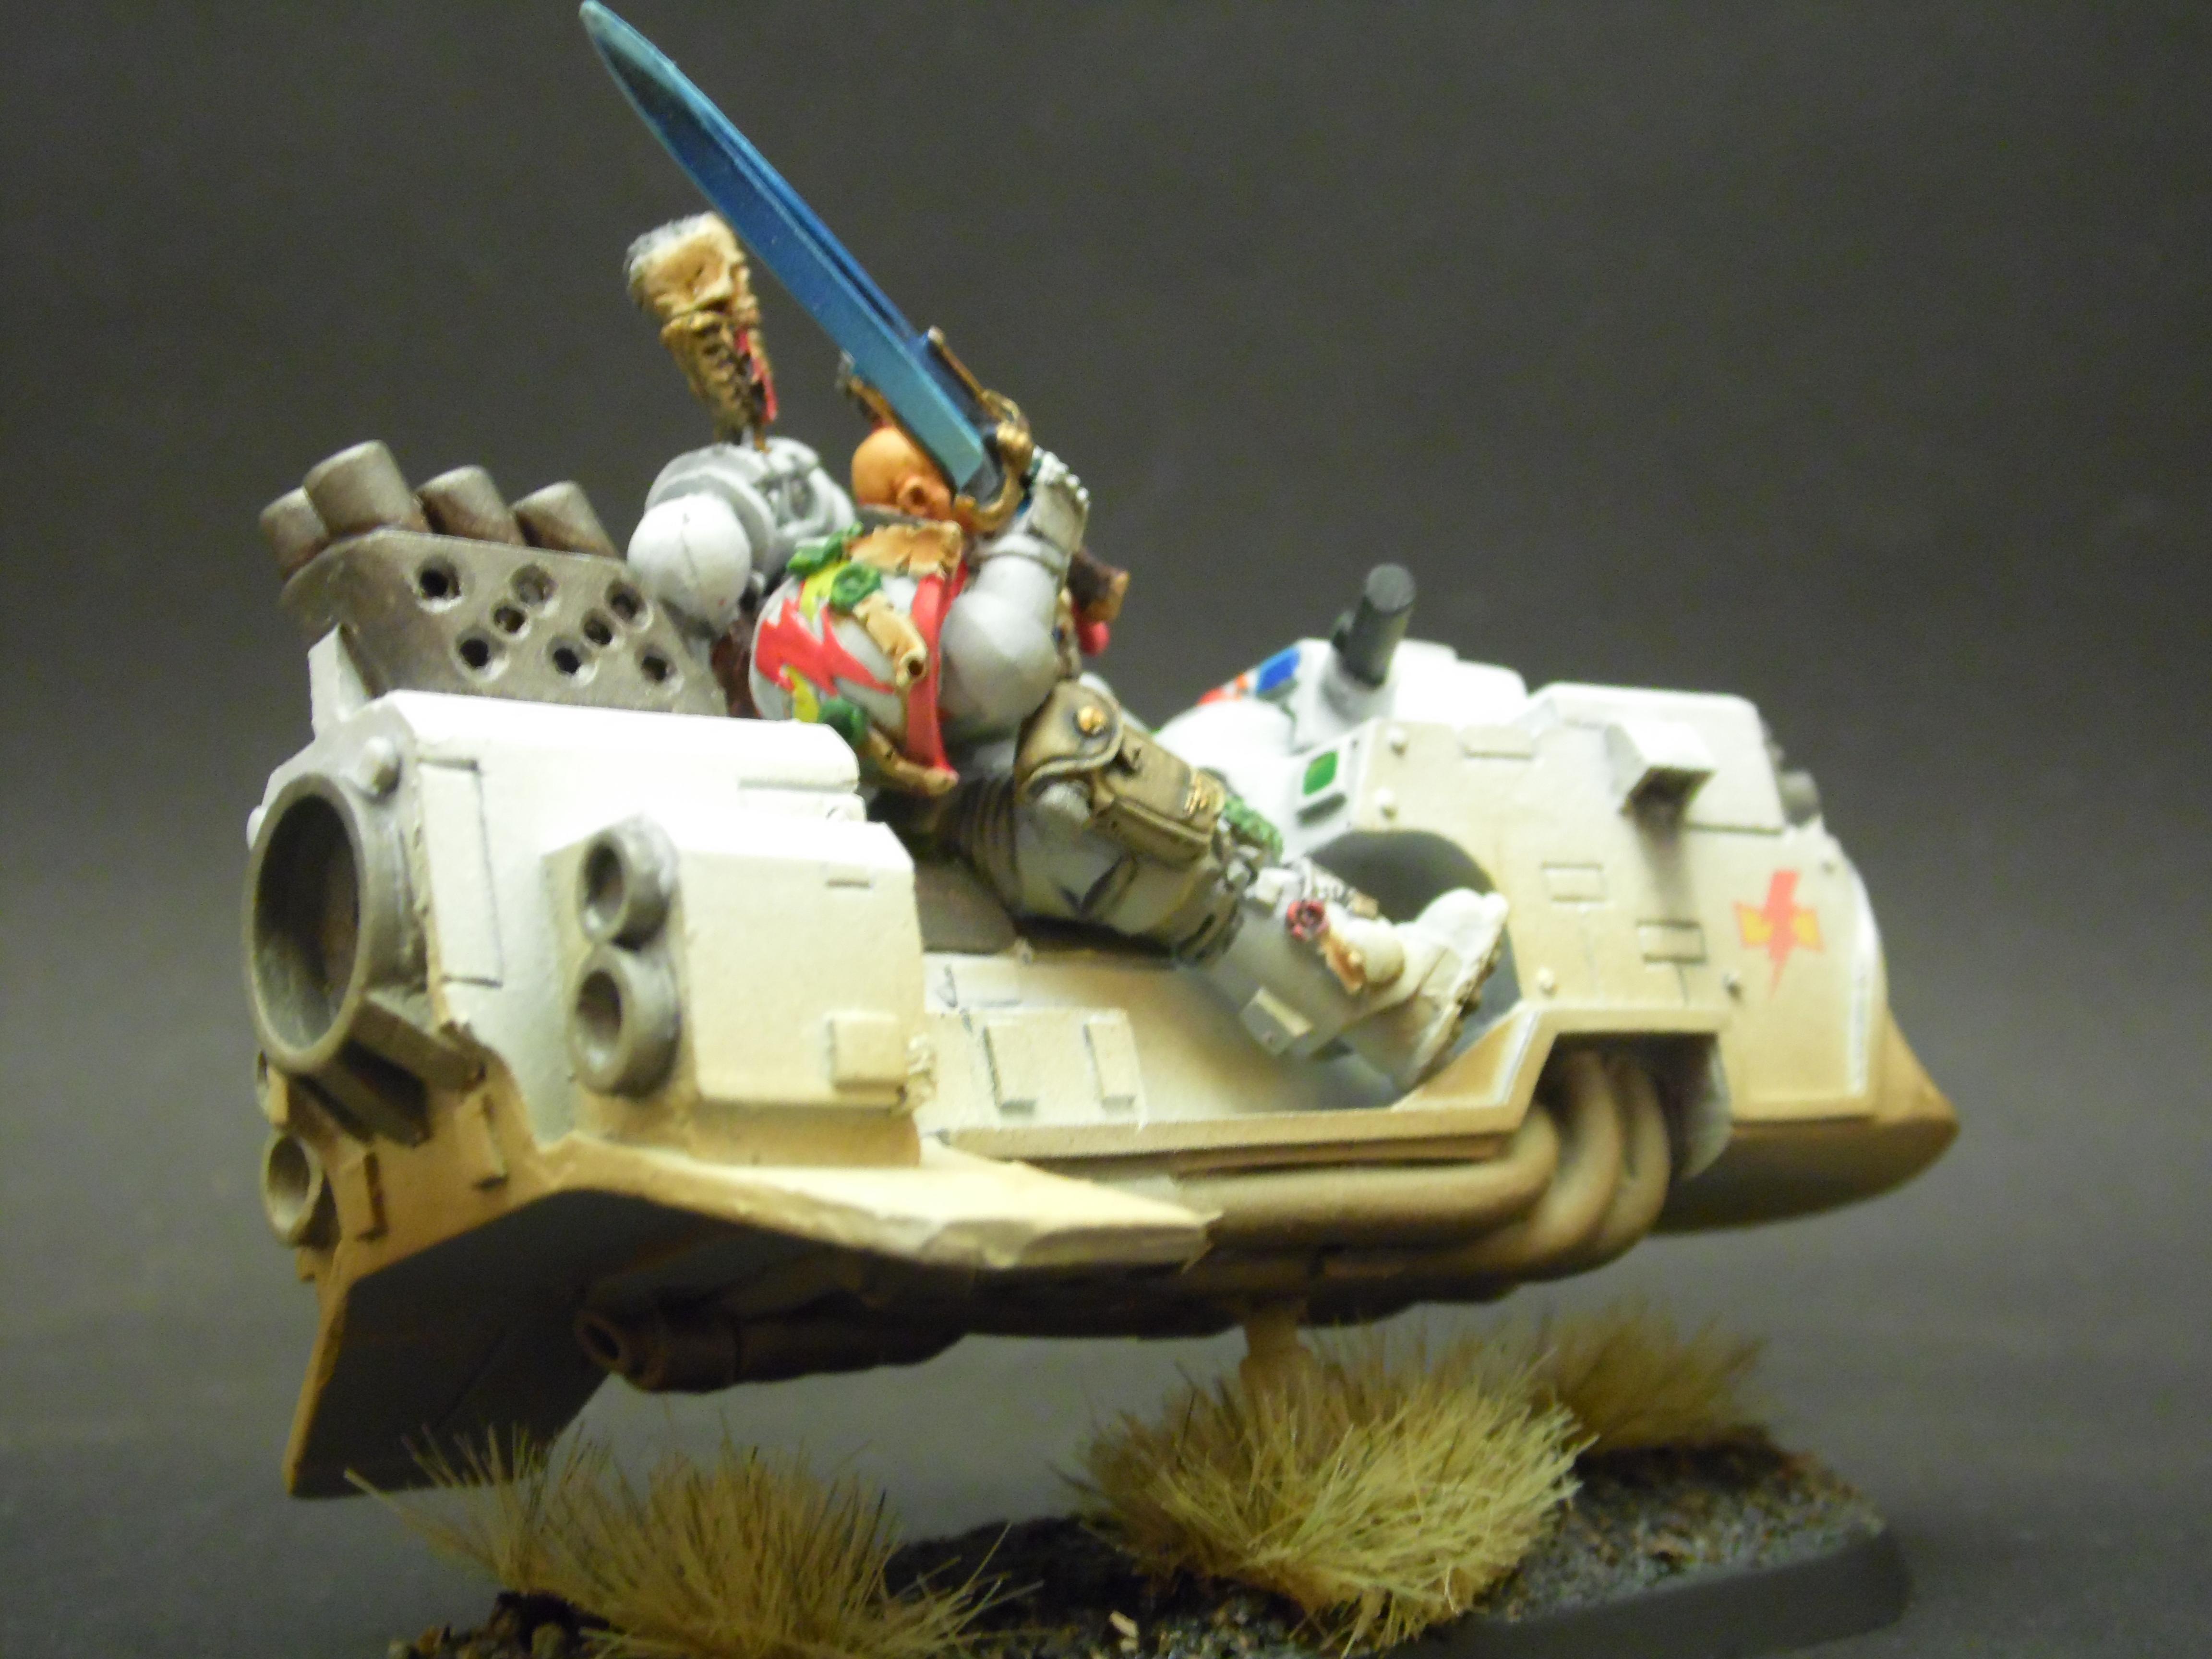 Khan, Kor'sarro, Moondrakkan, Painting, Rusty, Rustytankpainting, Scars, Tank, Warhammer 40,000, Warhammer Fantasy, White